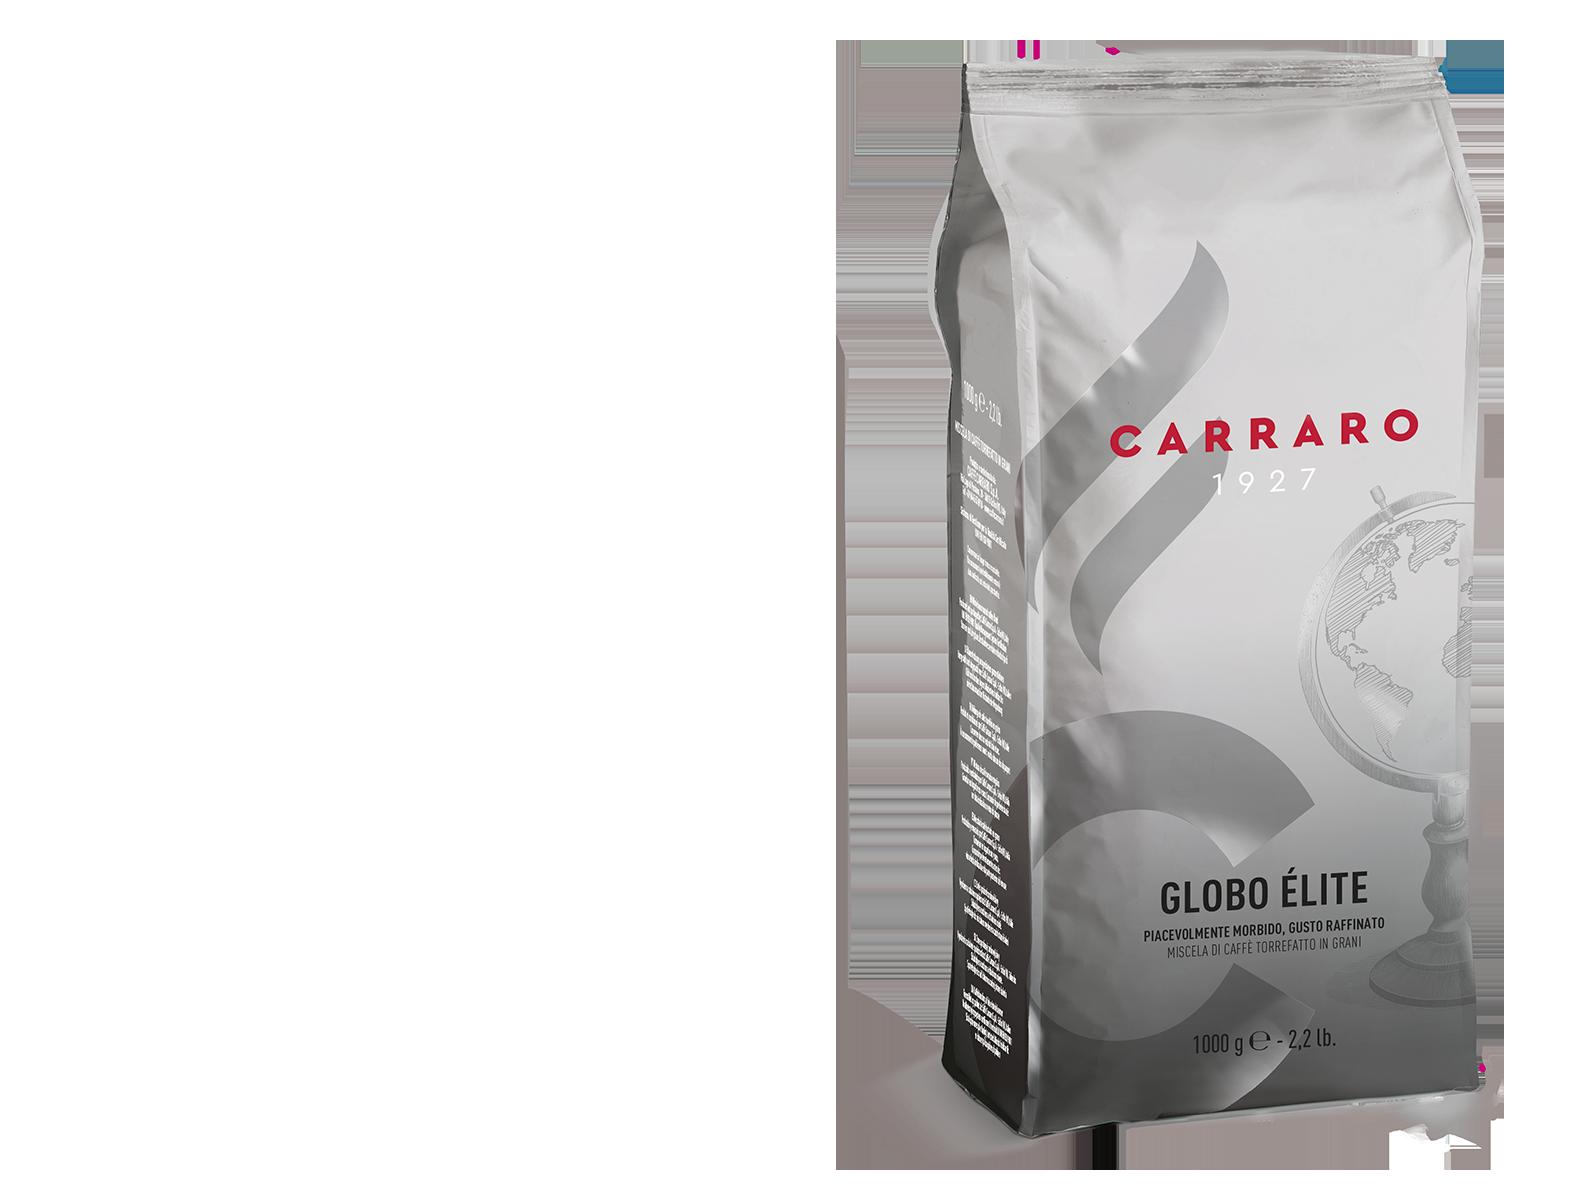 Globo Élite – coffee beans 1000 g